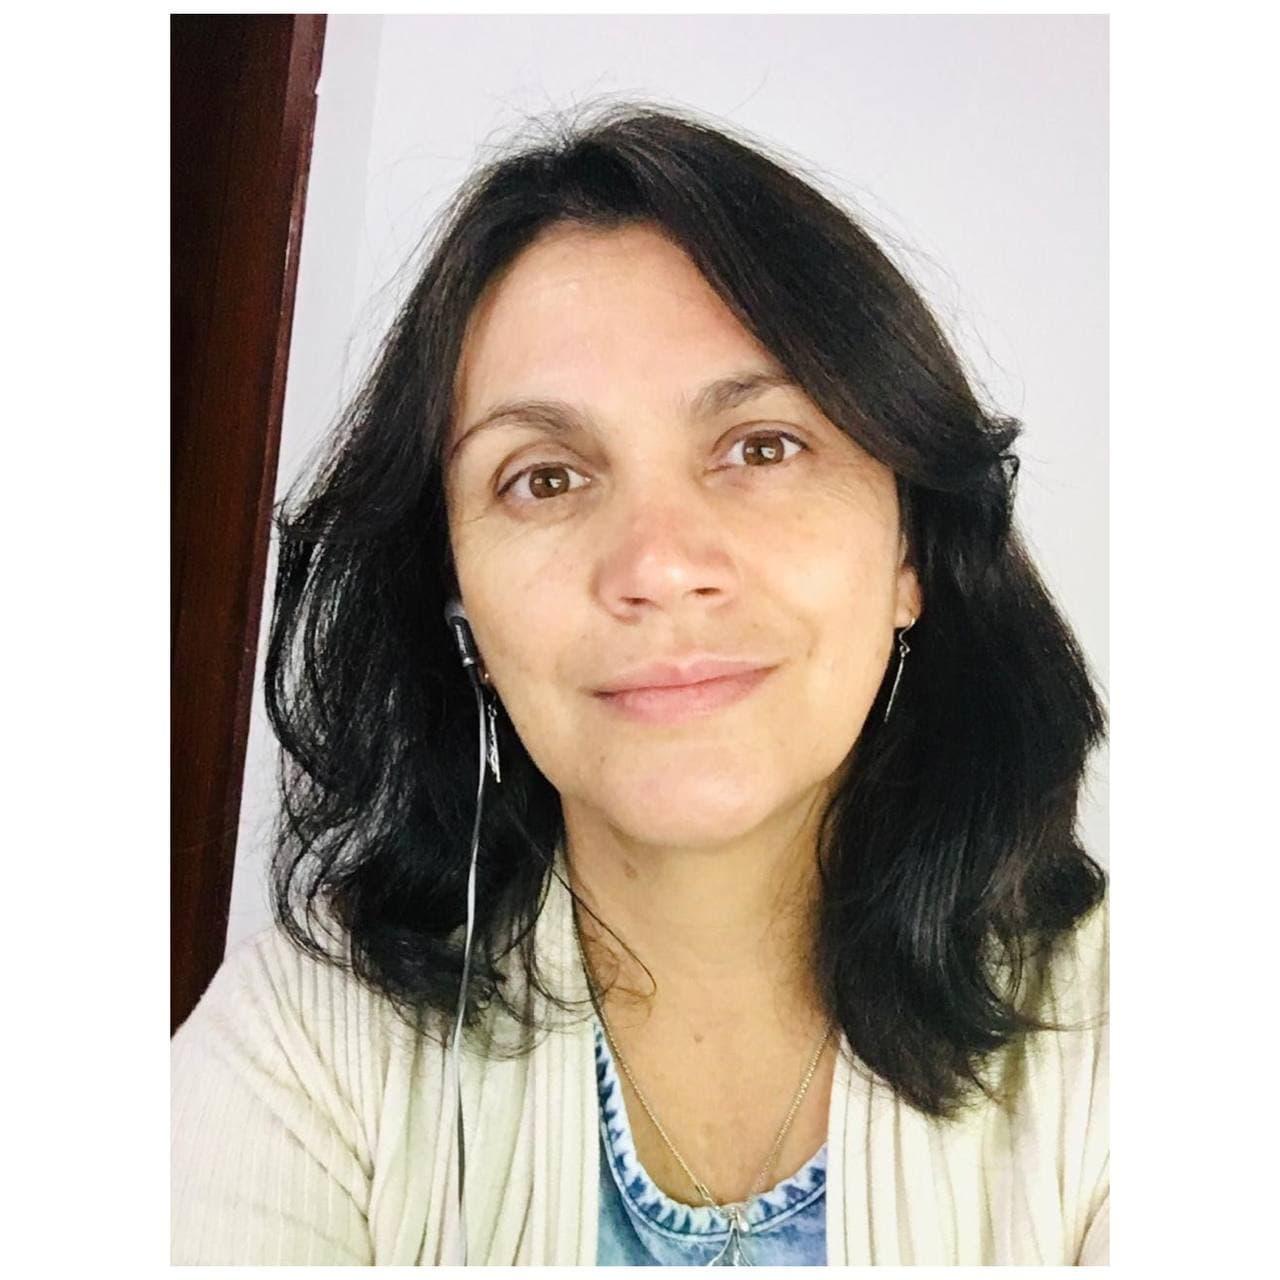 Eleriane Cristina Costa